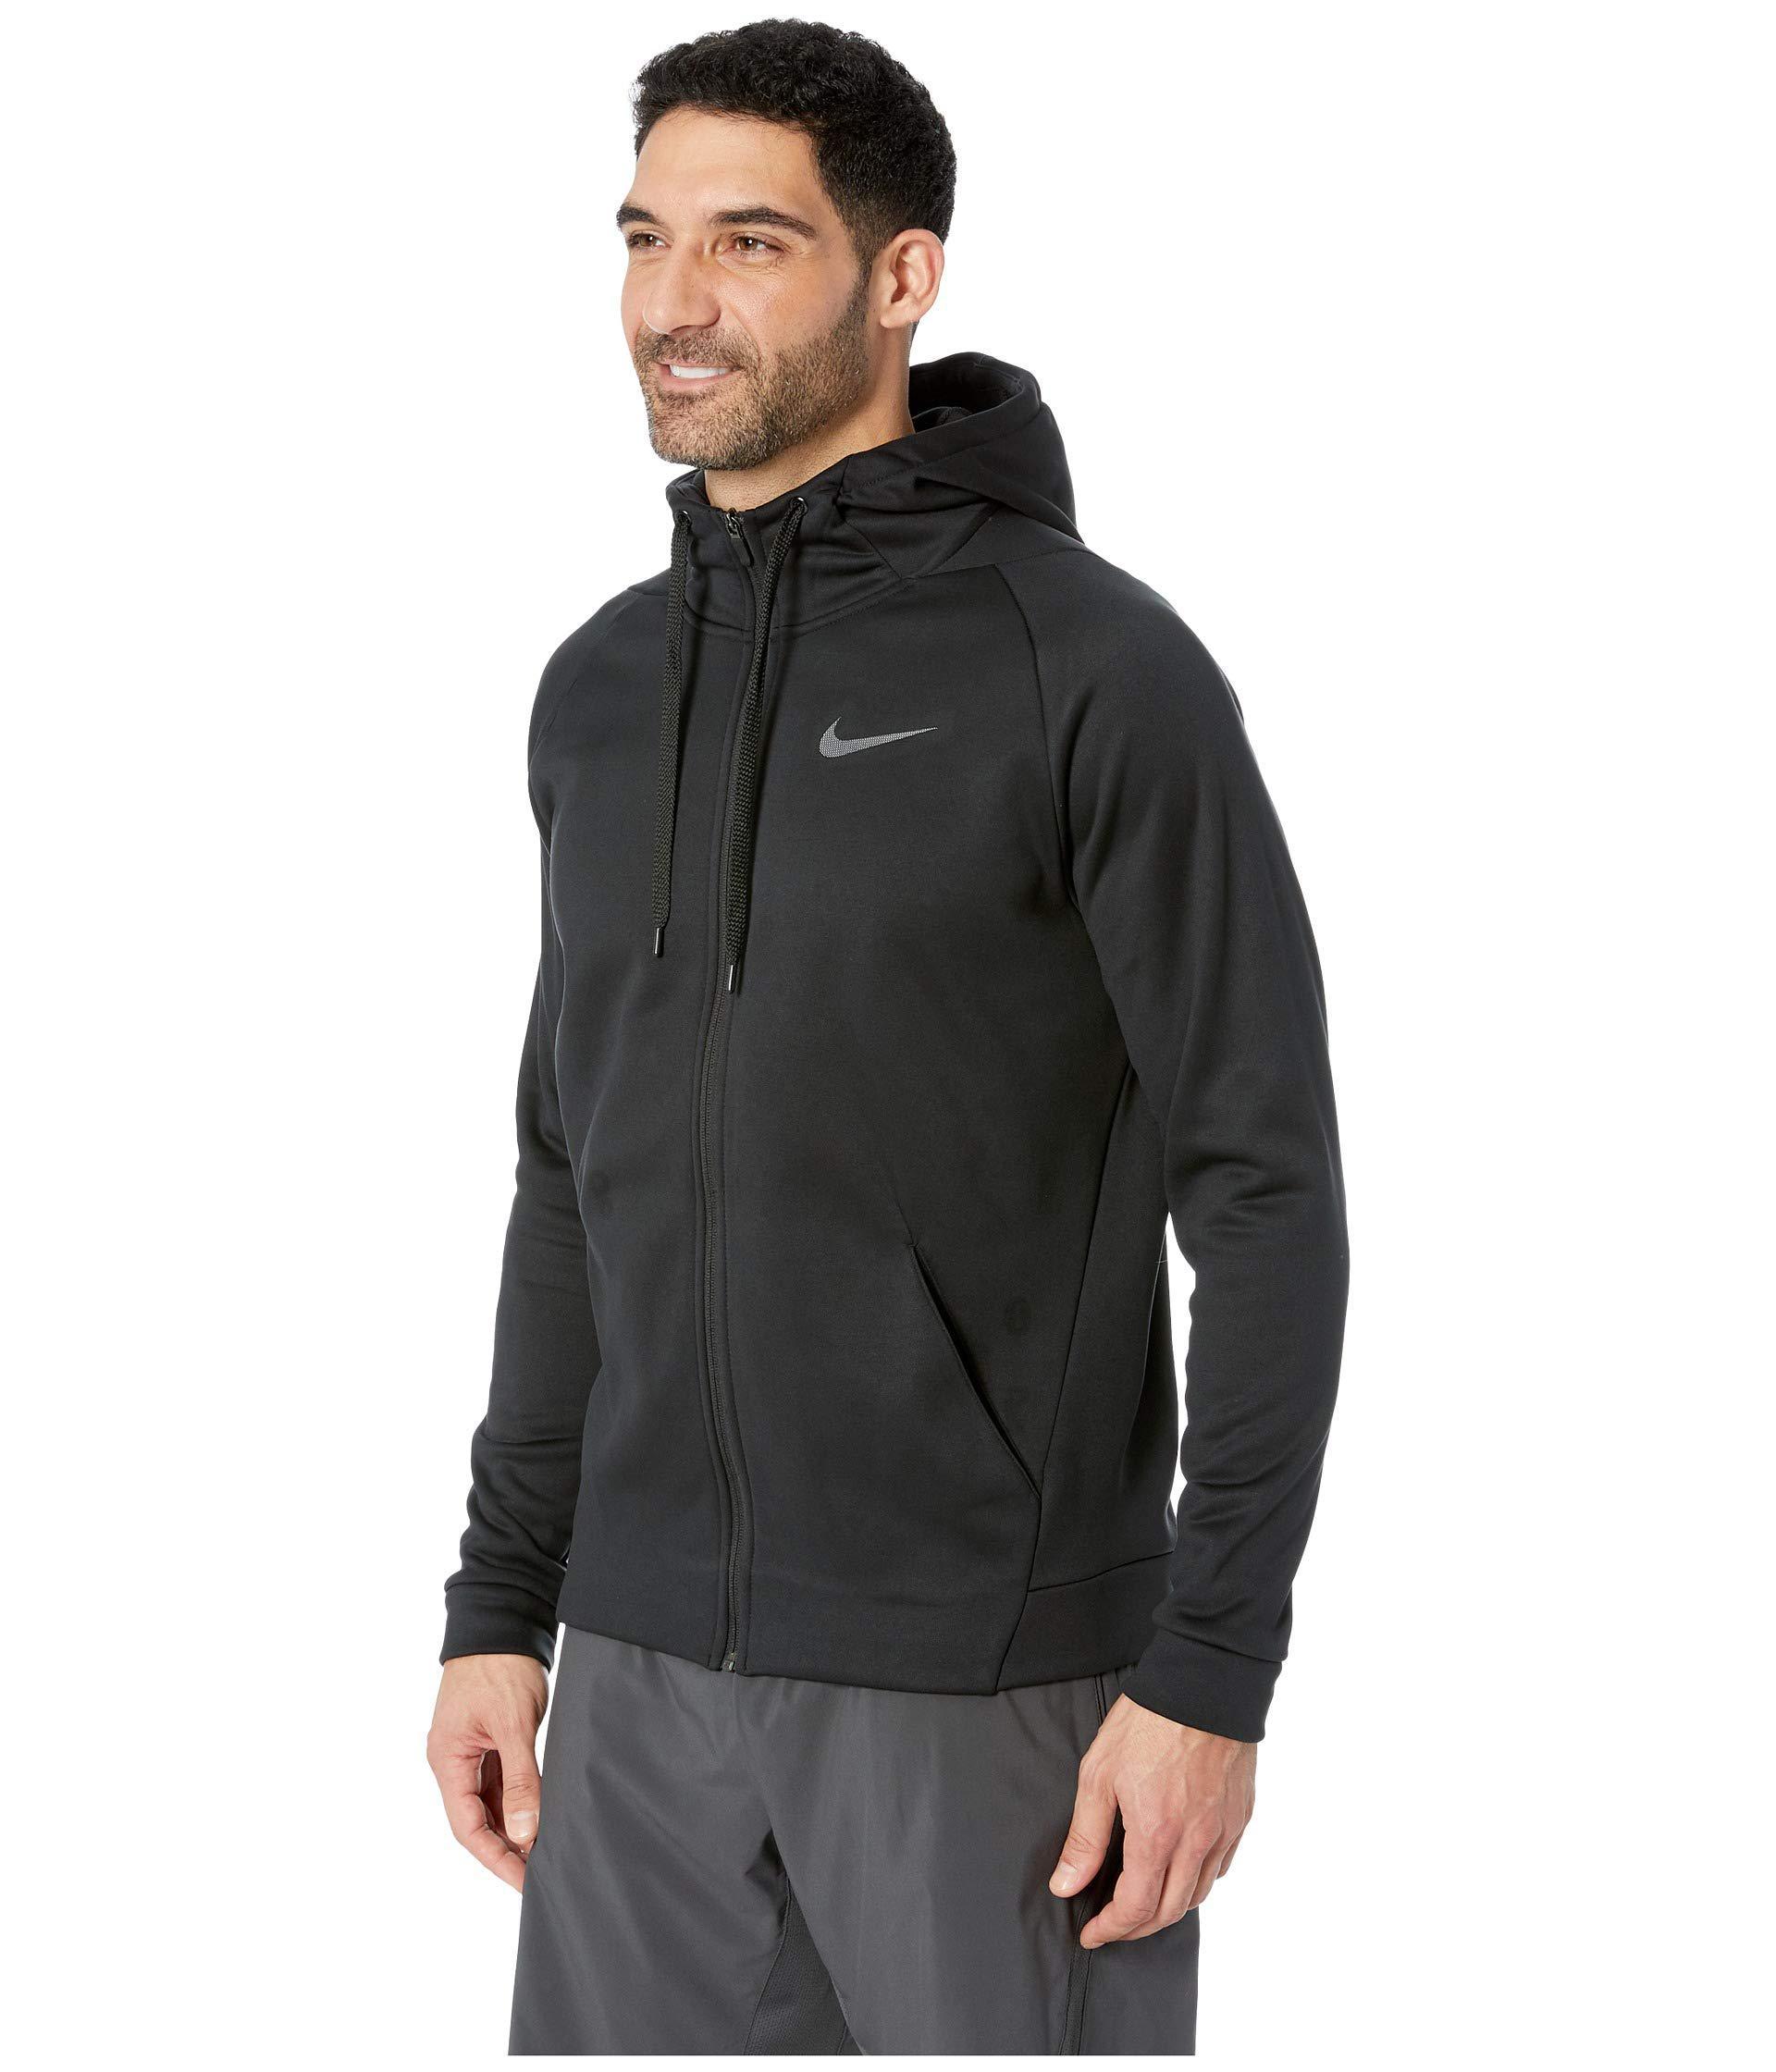 4aa9214bebc Lyst - Nike Dri-fit Therma Men s Full-zip Training Hoodie (charcoal Heather  black) Men s Sweatshirt in Black for Men